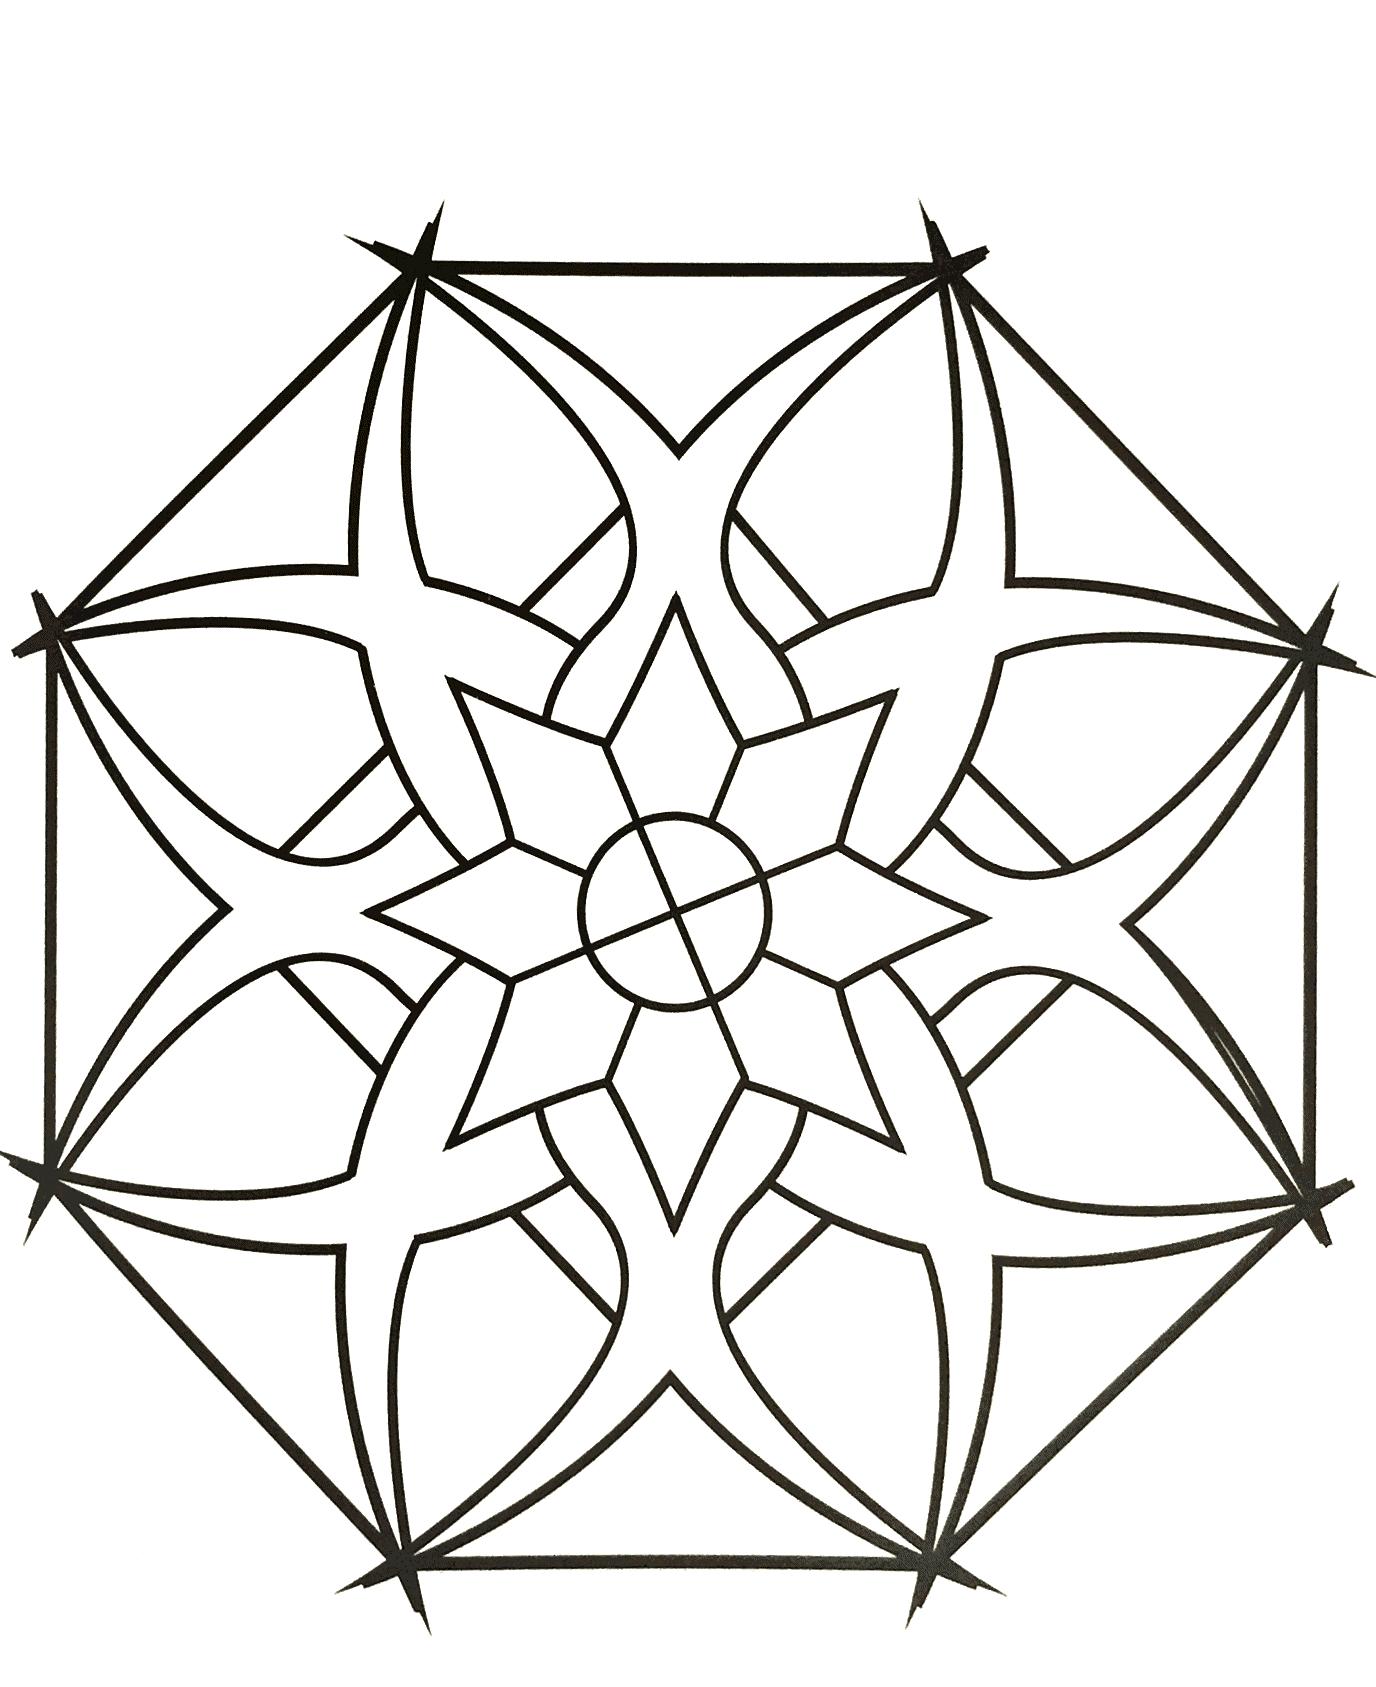 Incredible Zen & Anti-stress Mandala. Designing and coloring mandalas bring peace and tranquility.